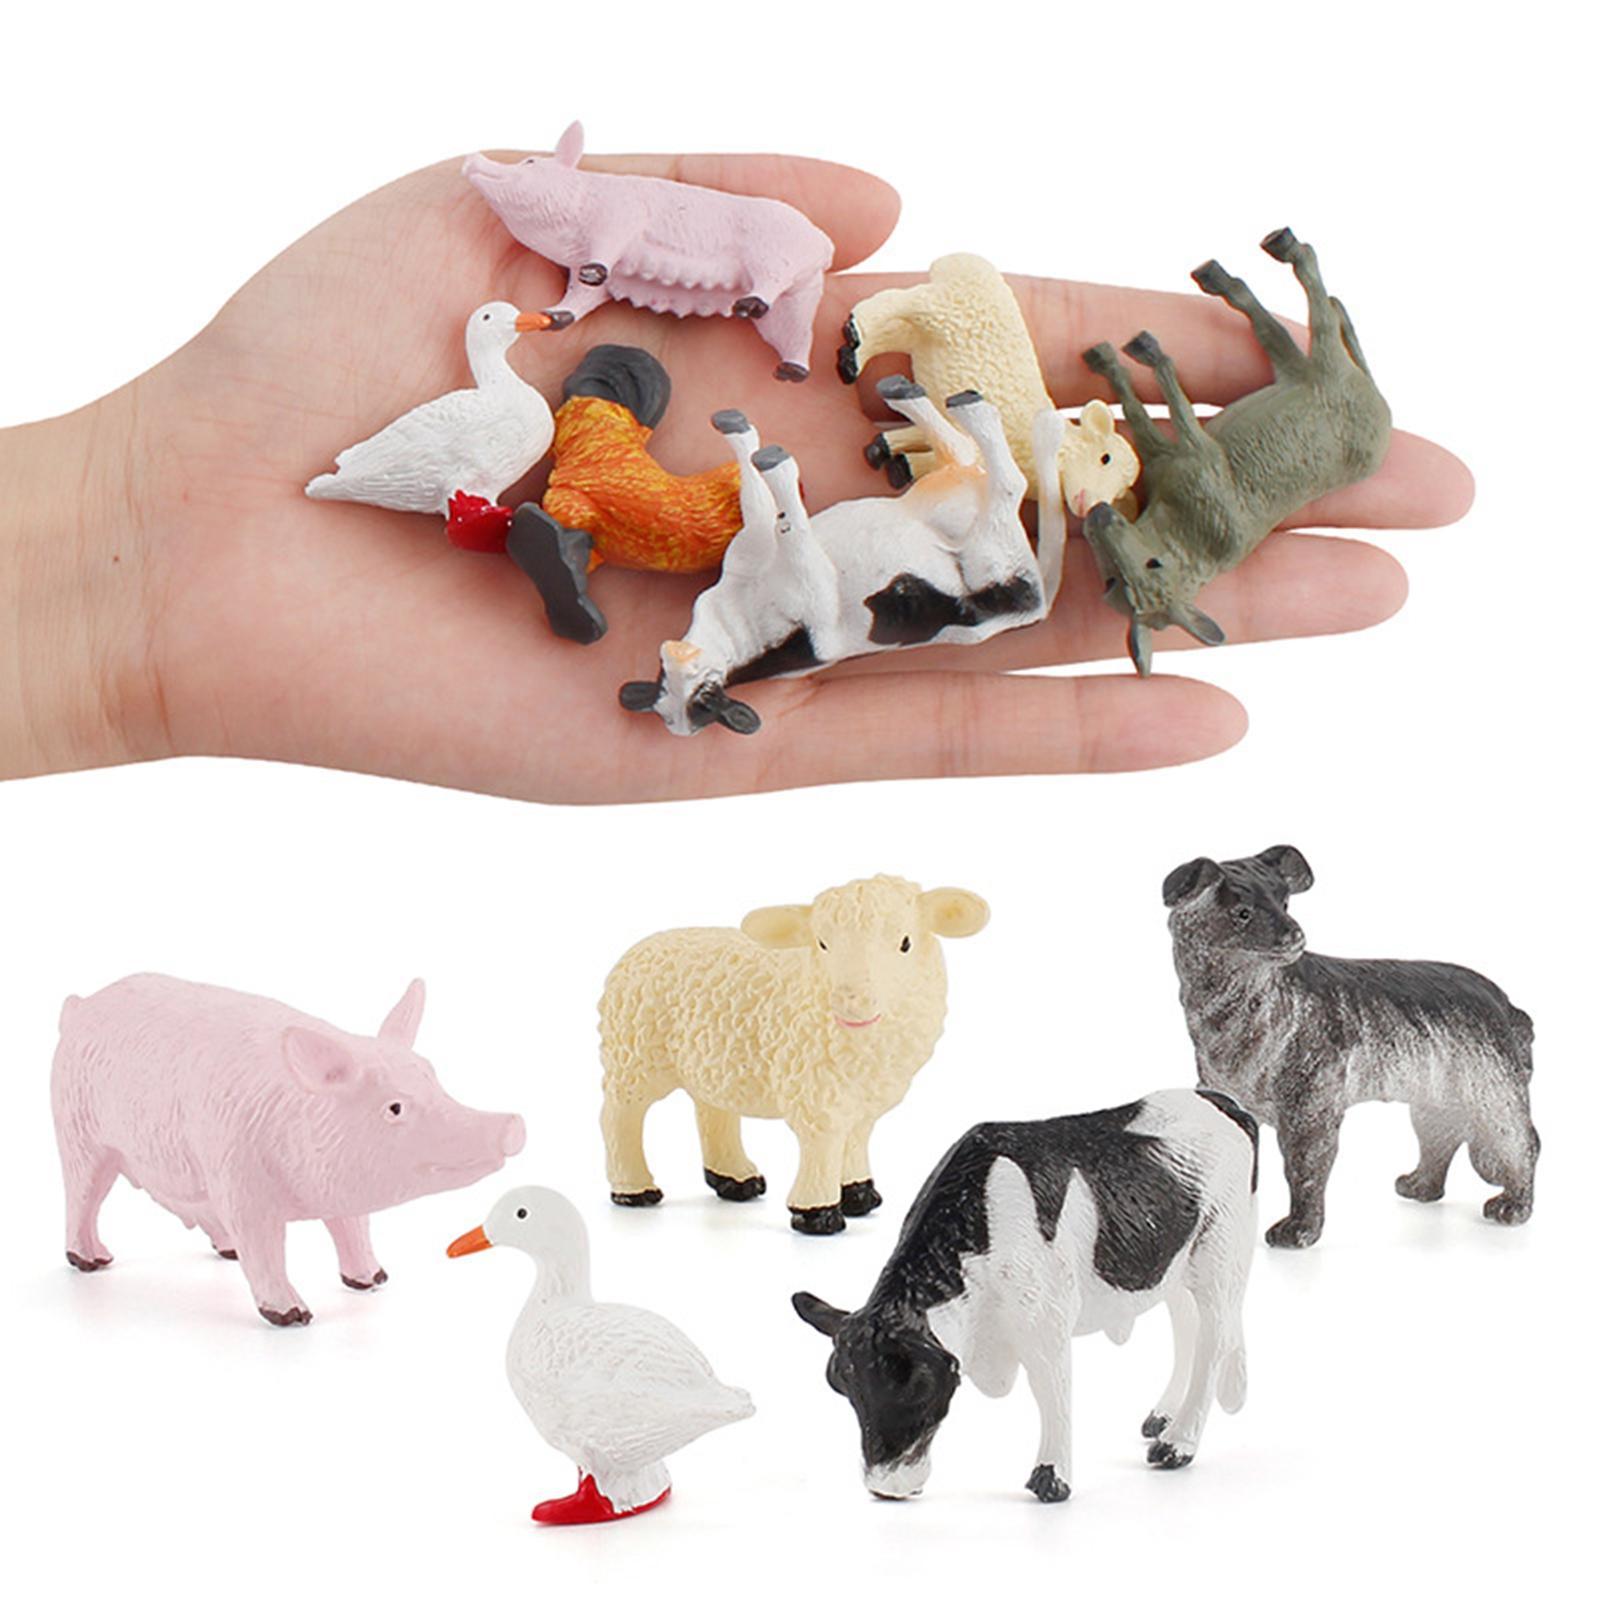 AliExpress - 12Pcs/Set Cartoon Animal Farm Poultry Landscape Mini Ornament Garden Decoration Kids Educational Toys for Children Gifts